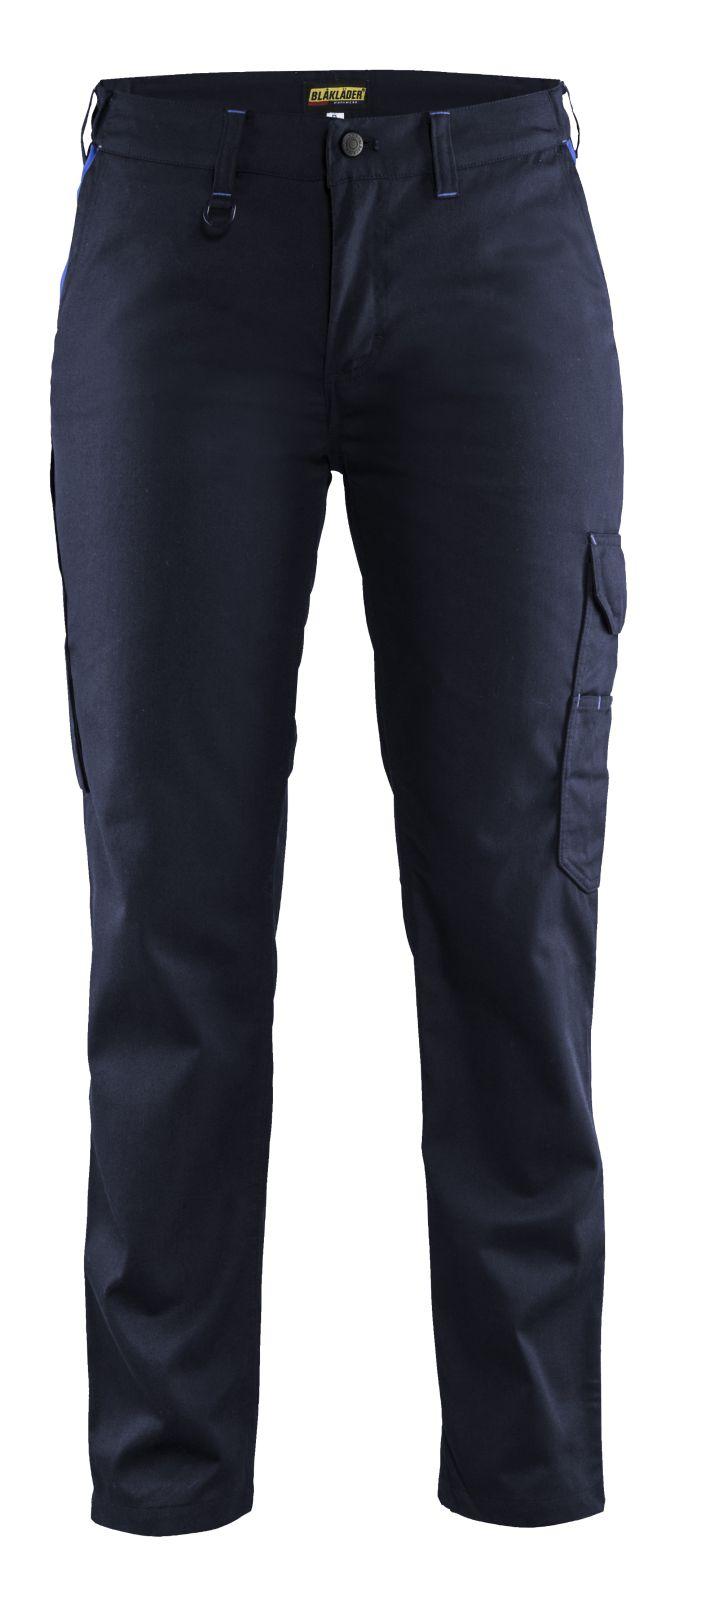 Blaklader Dames werkbroeken 71041800 marineblauw-korenblauw(8985)